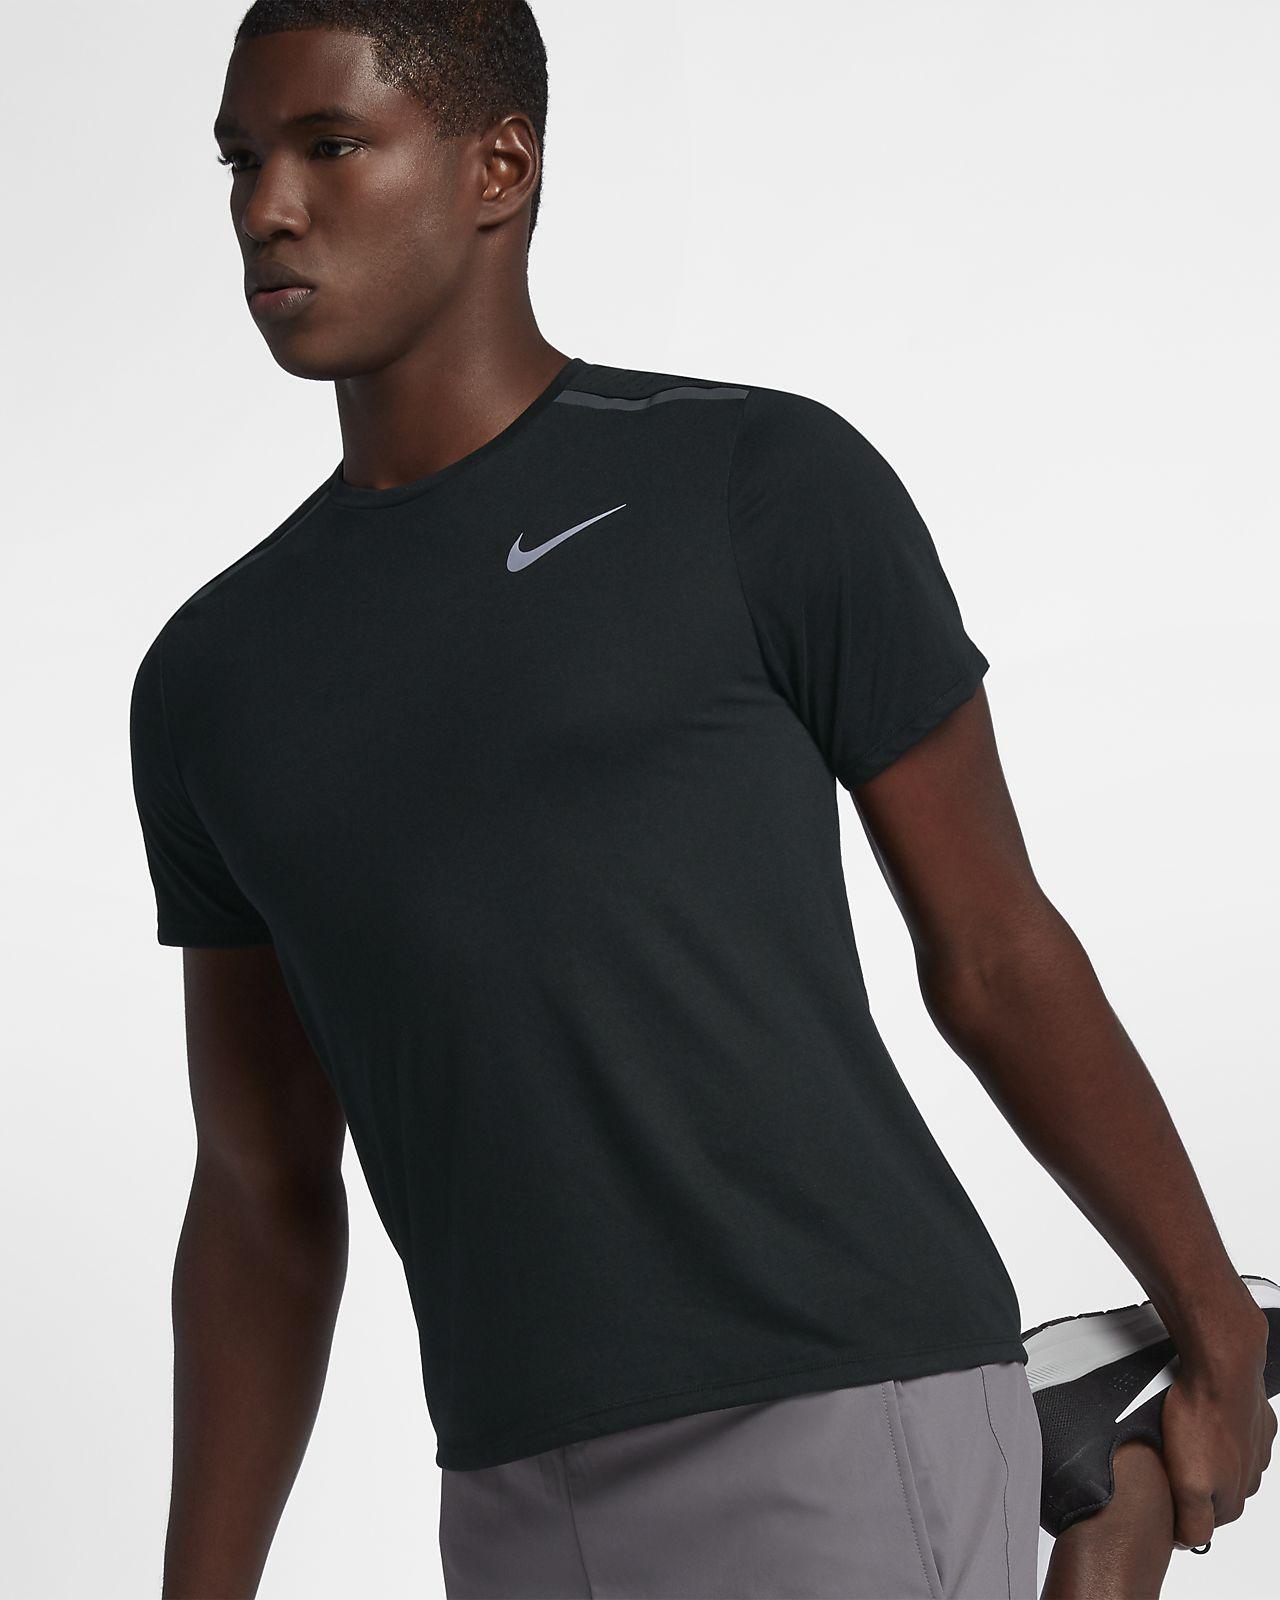 Nike Dri FIT Rise 365 Men's Short Sleeve Running Top